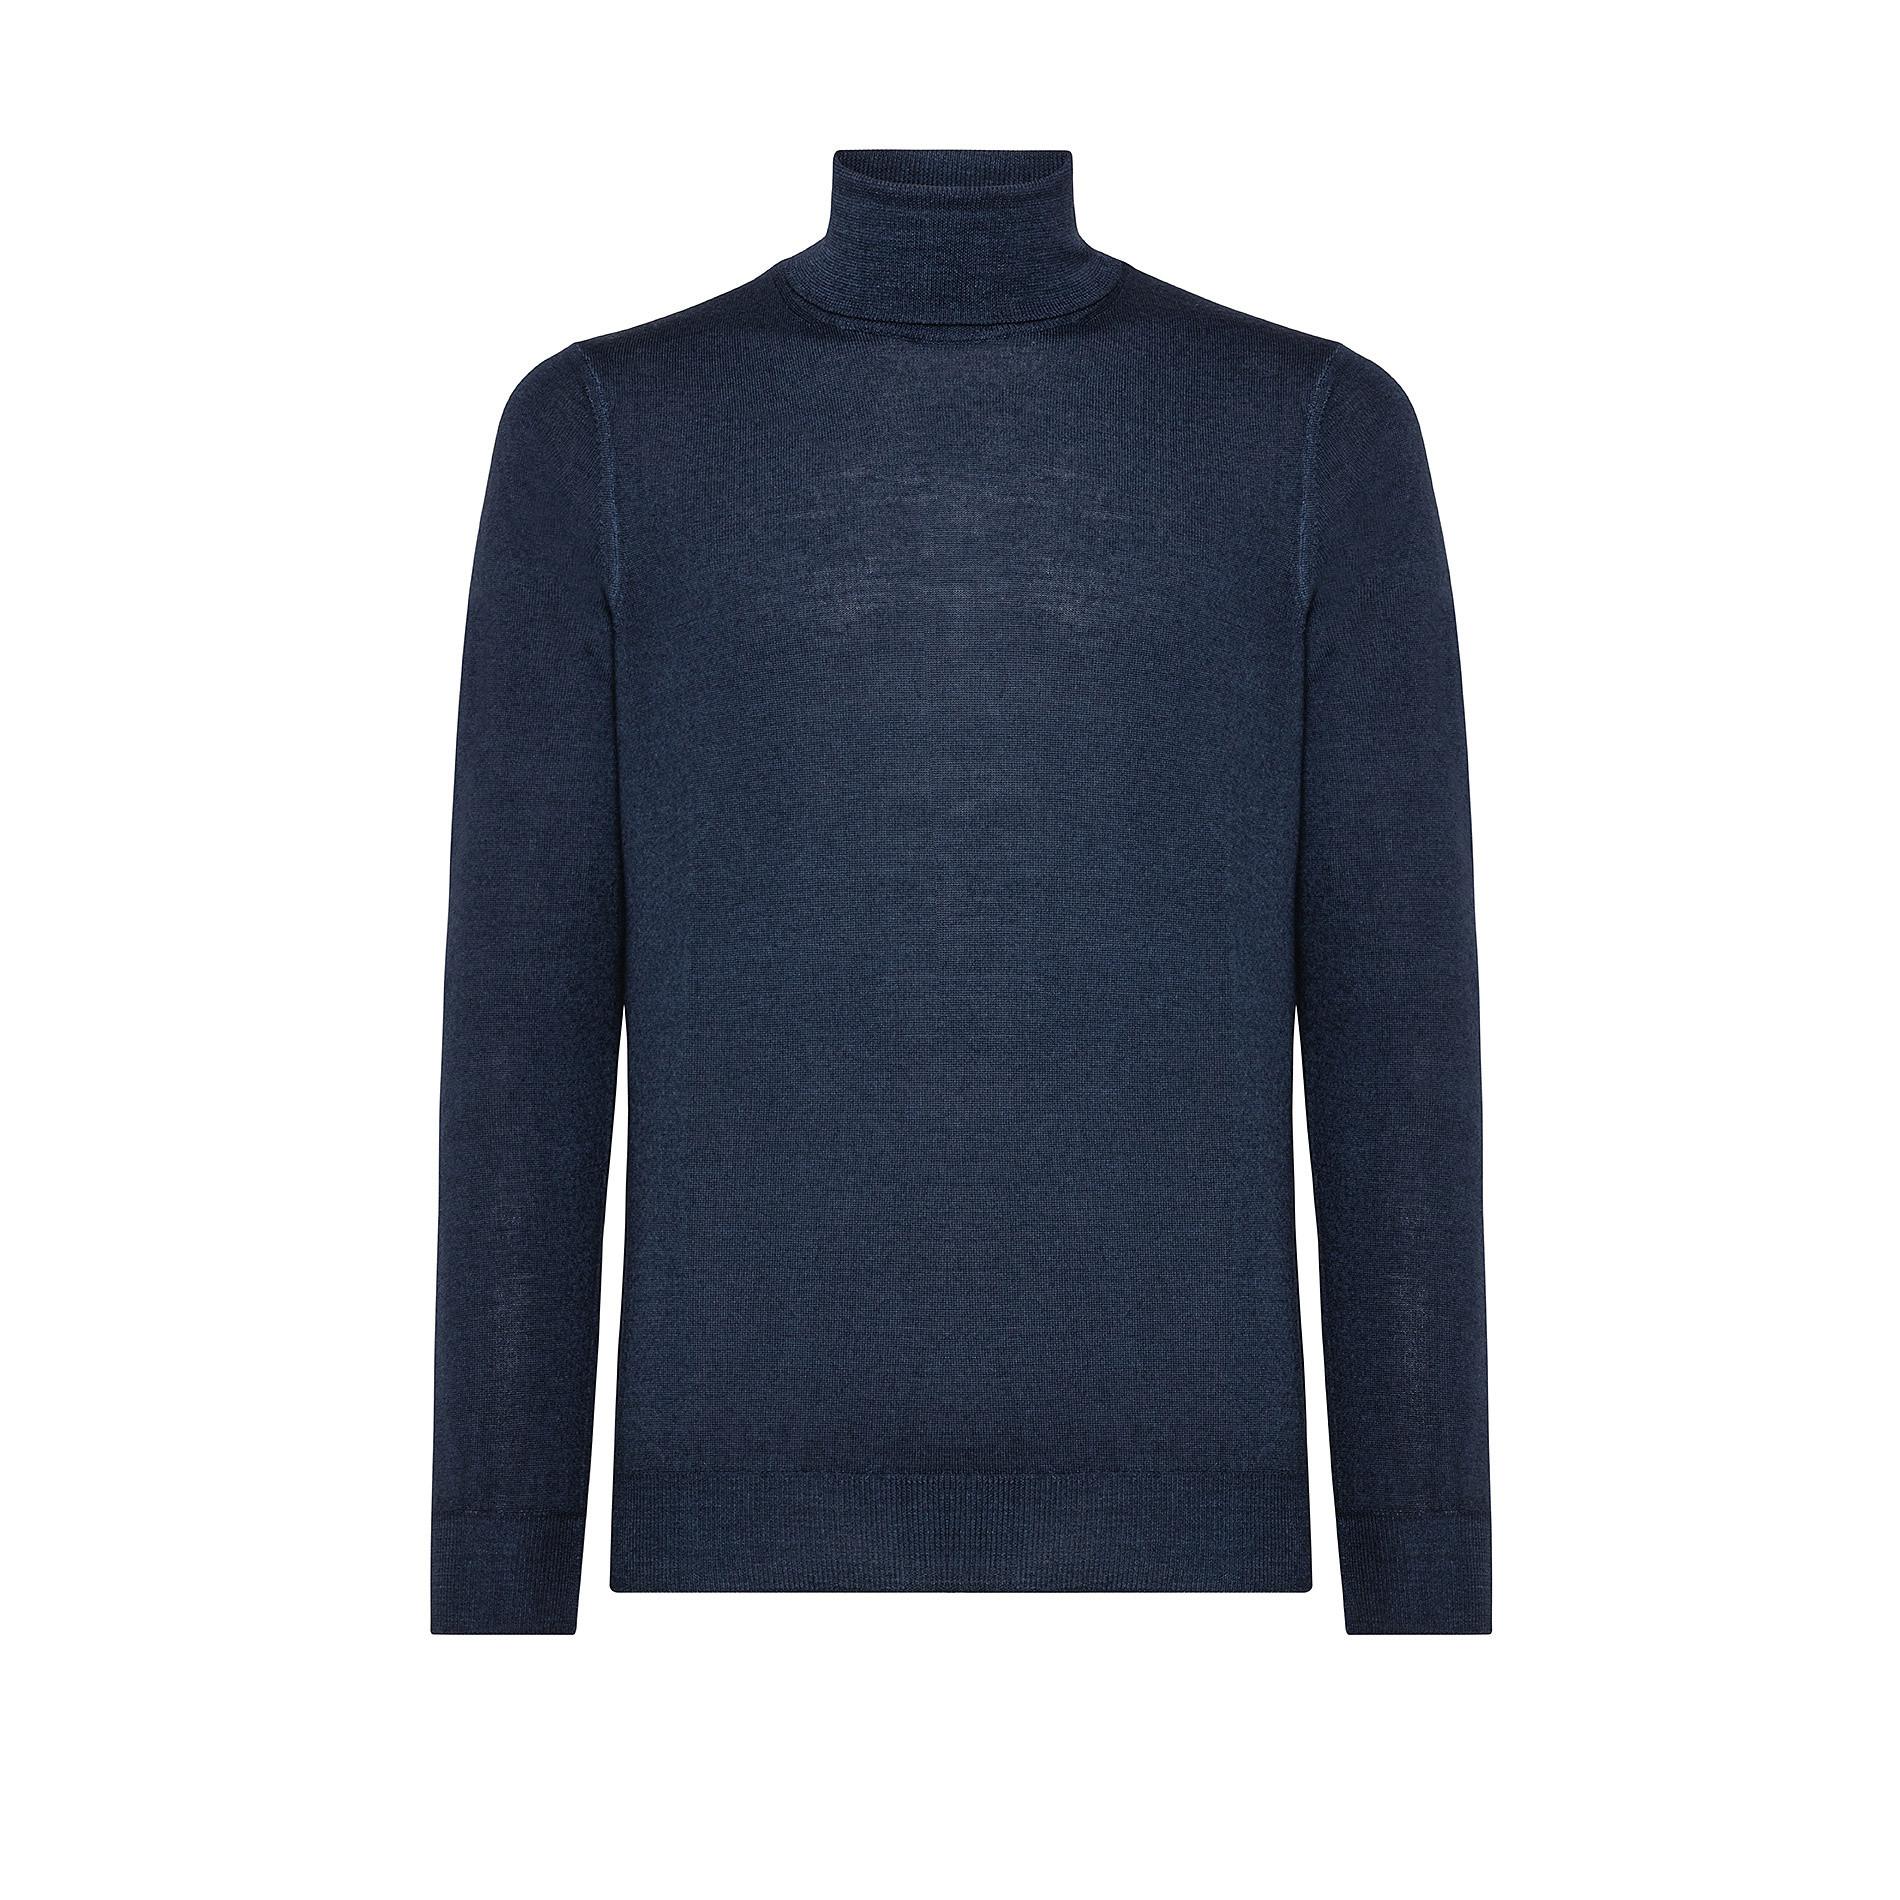 Pullover lana merinos collo alto, Blu, large image number 0